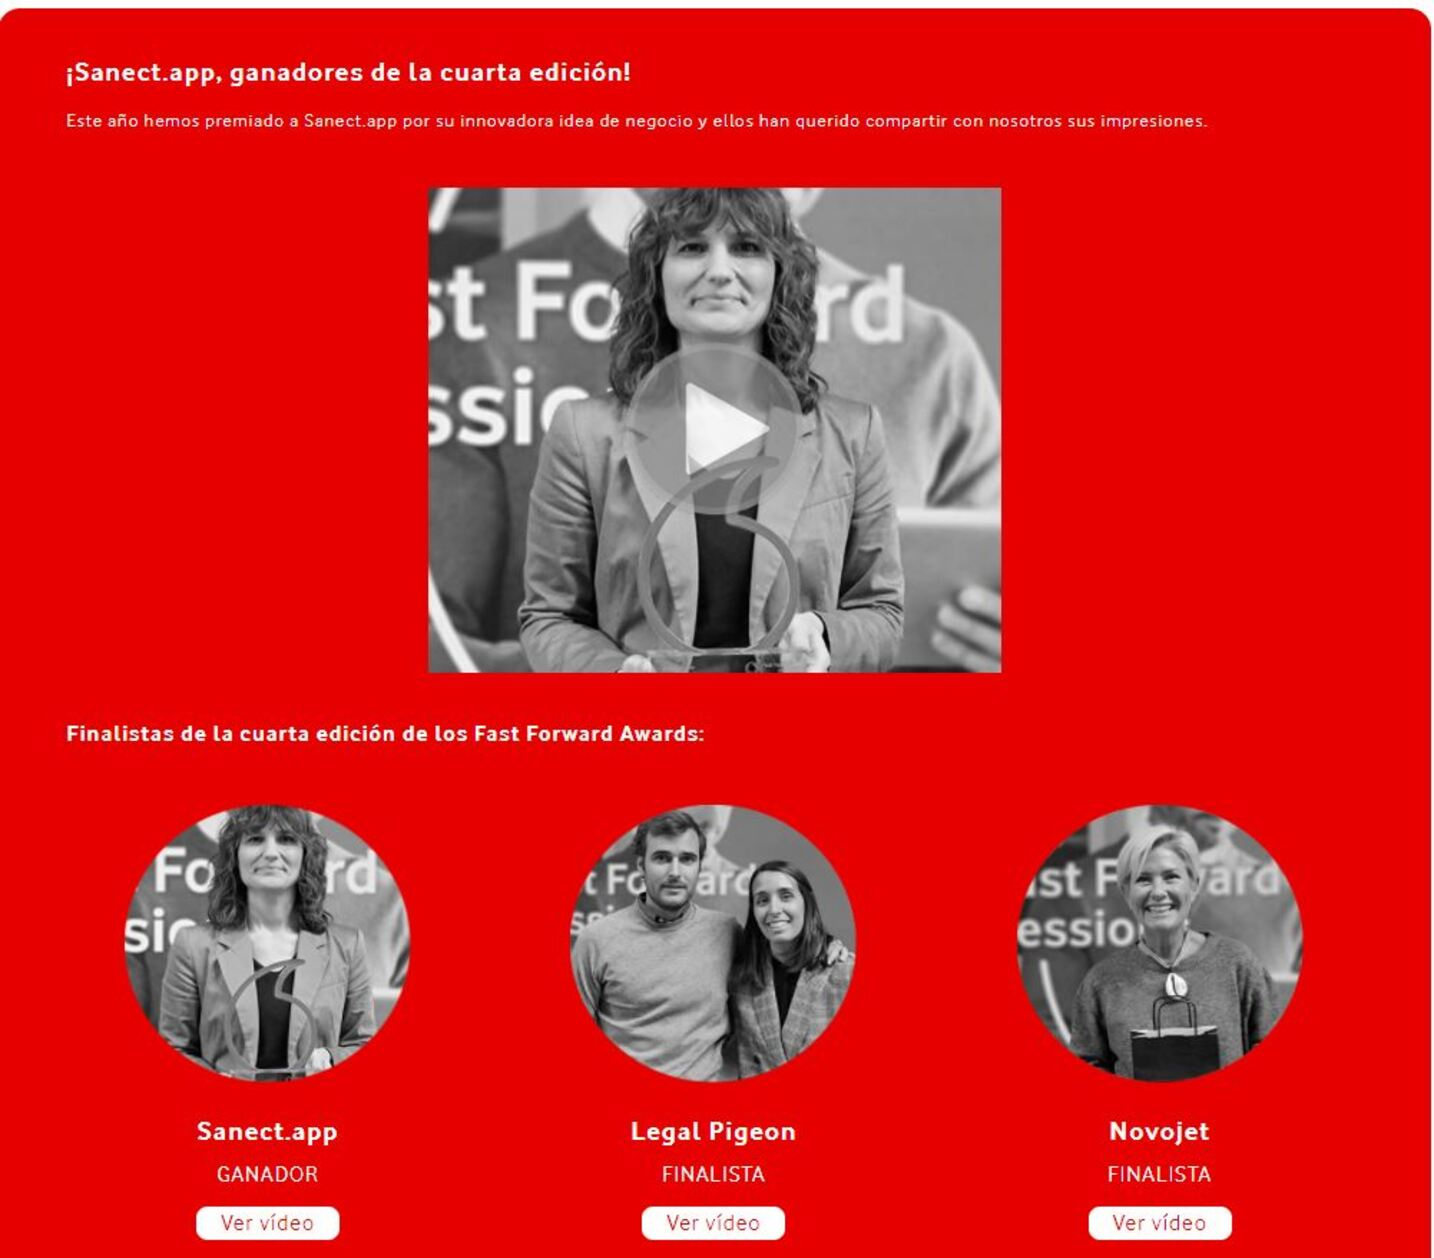 Fastforward Legal Pigeon Vodafone